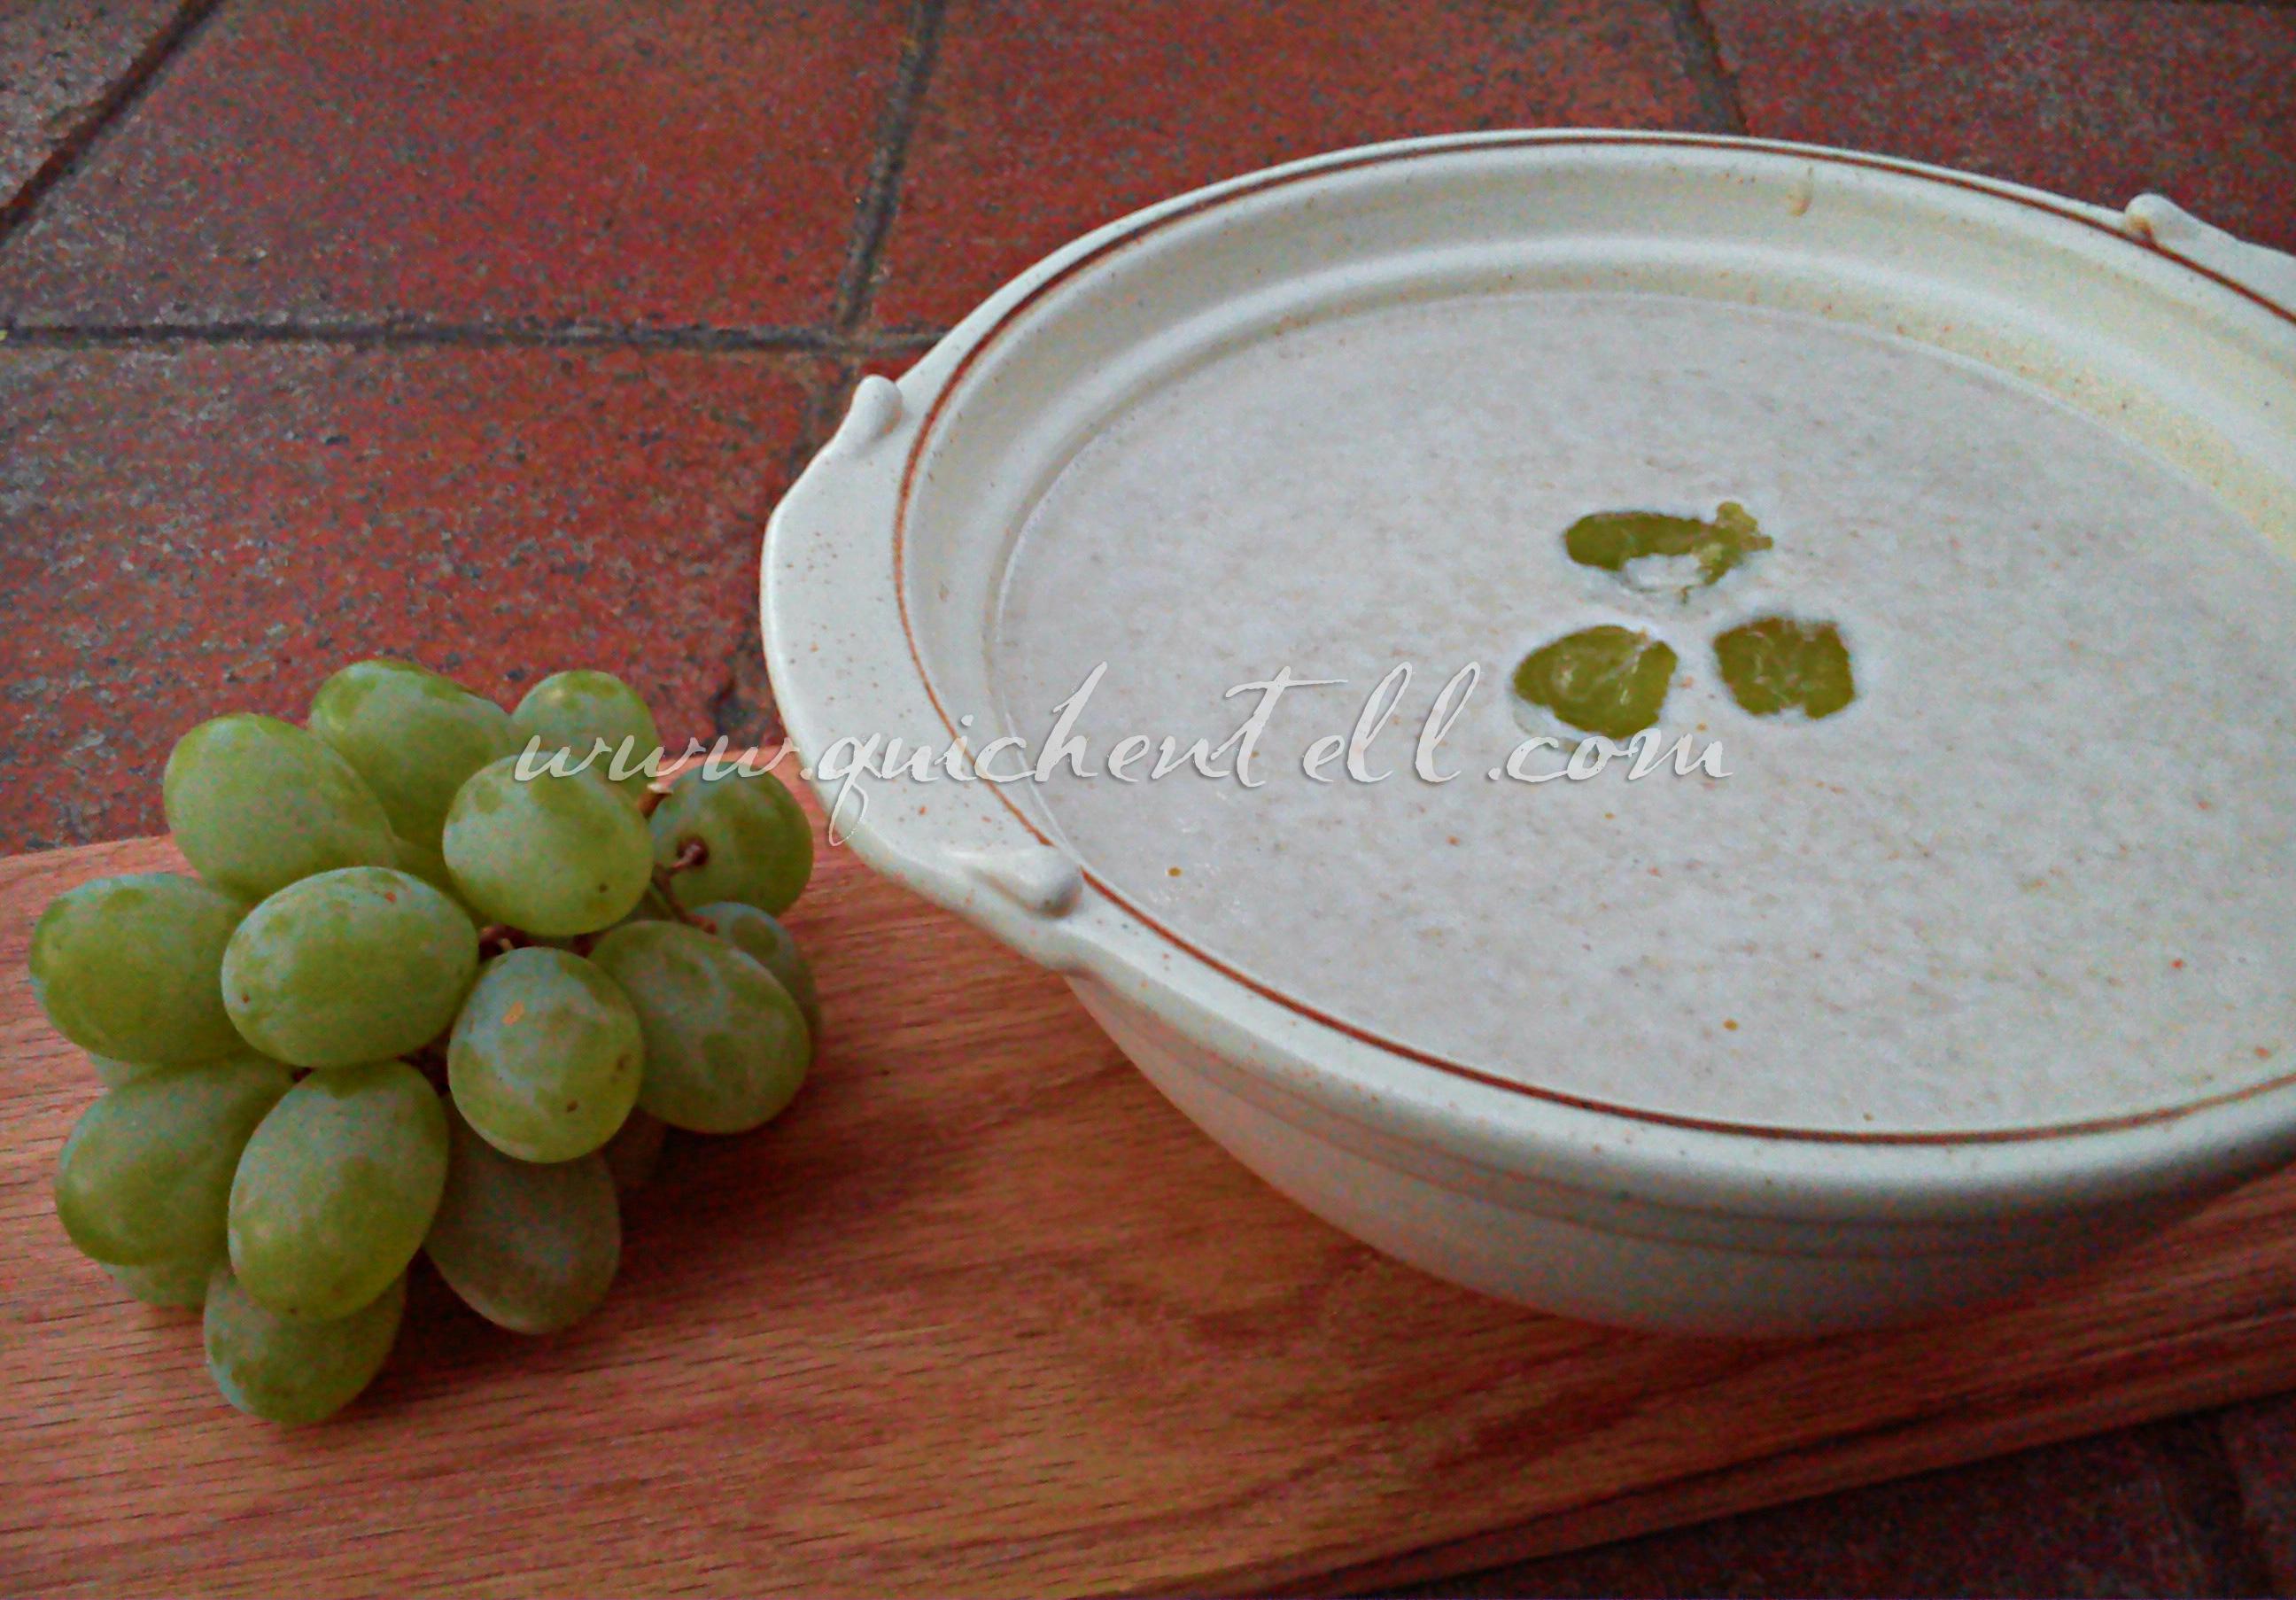 almond-and-grape-soup-750x900